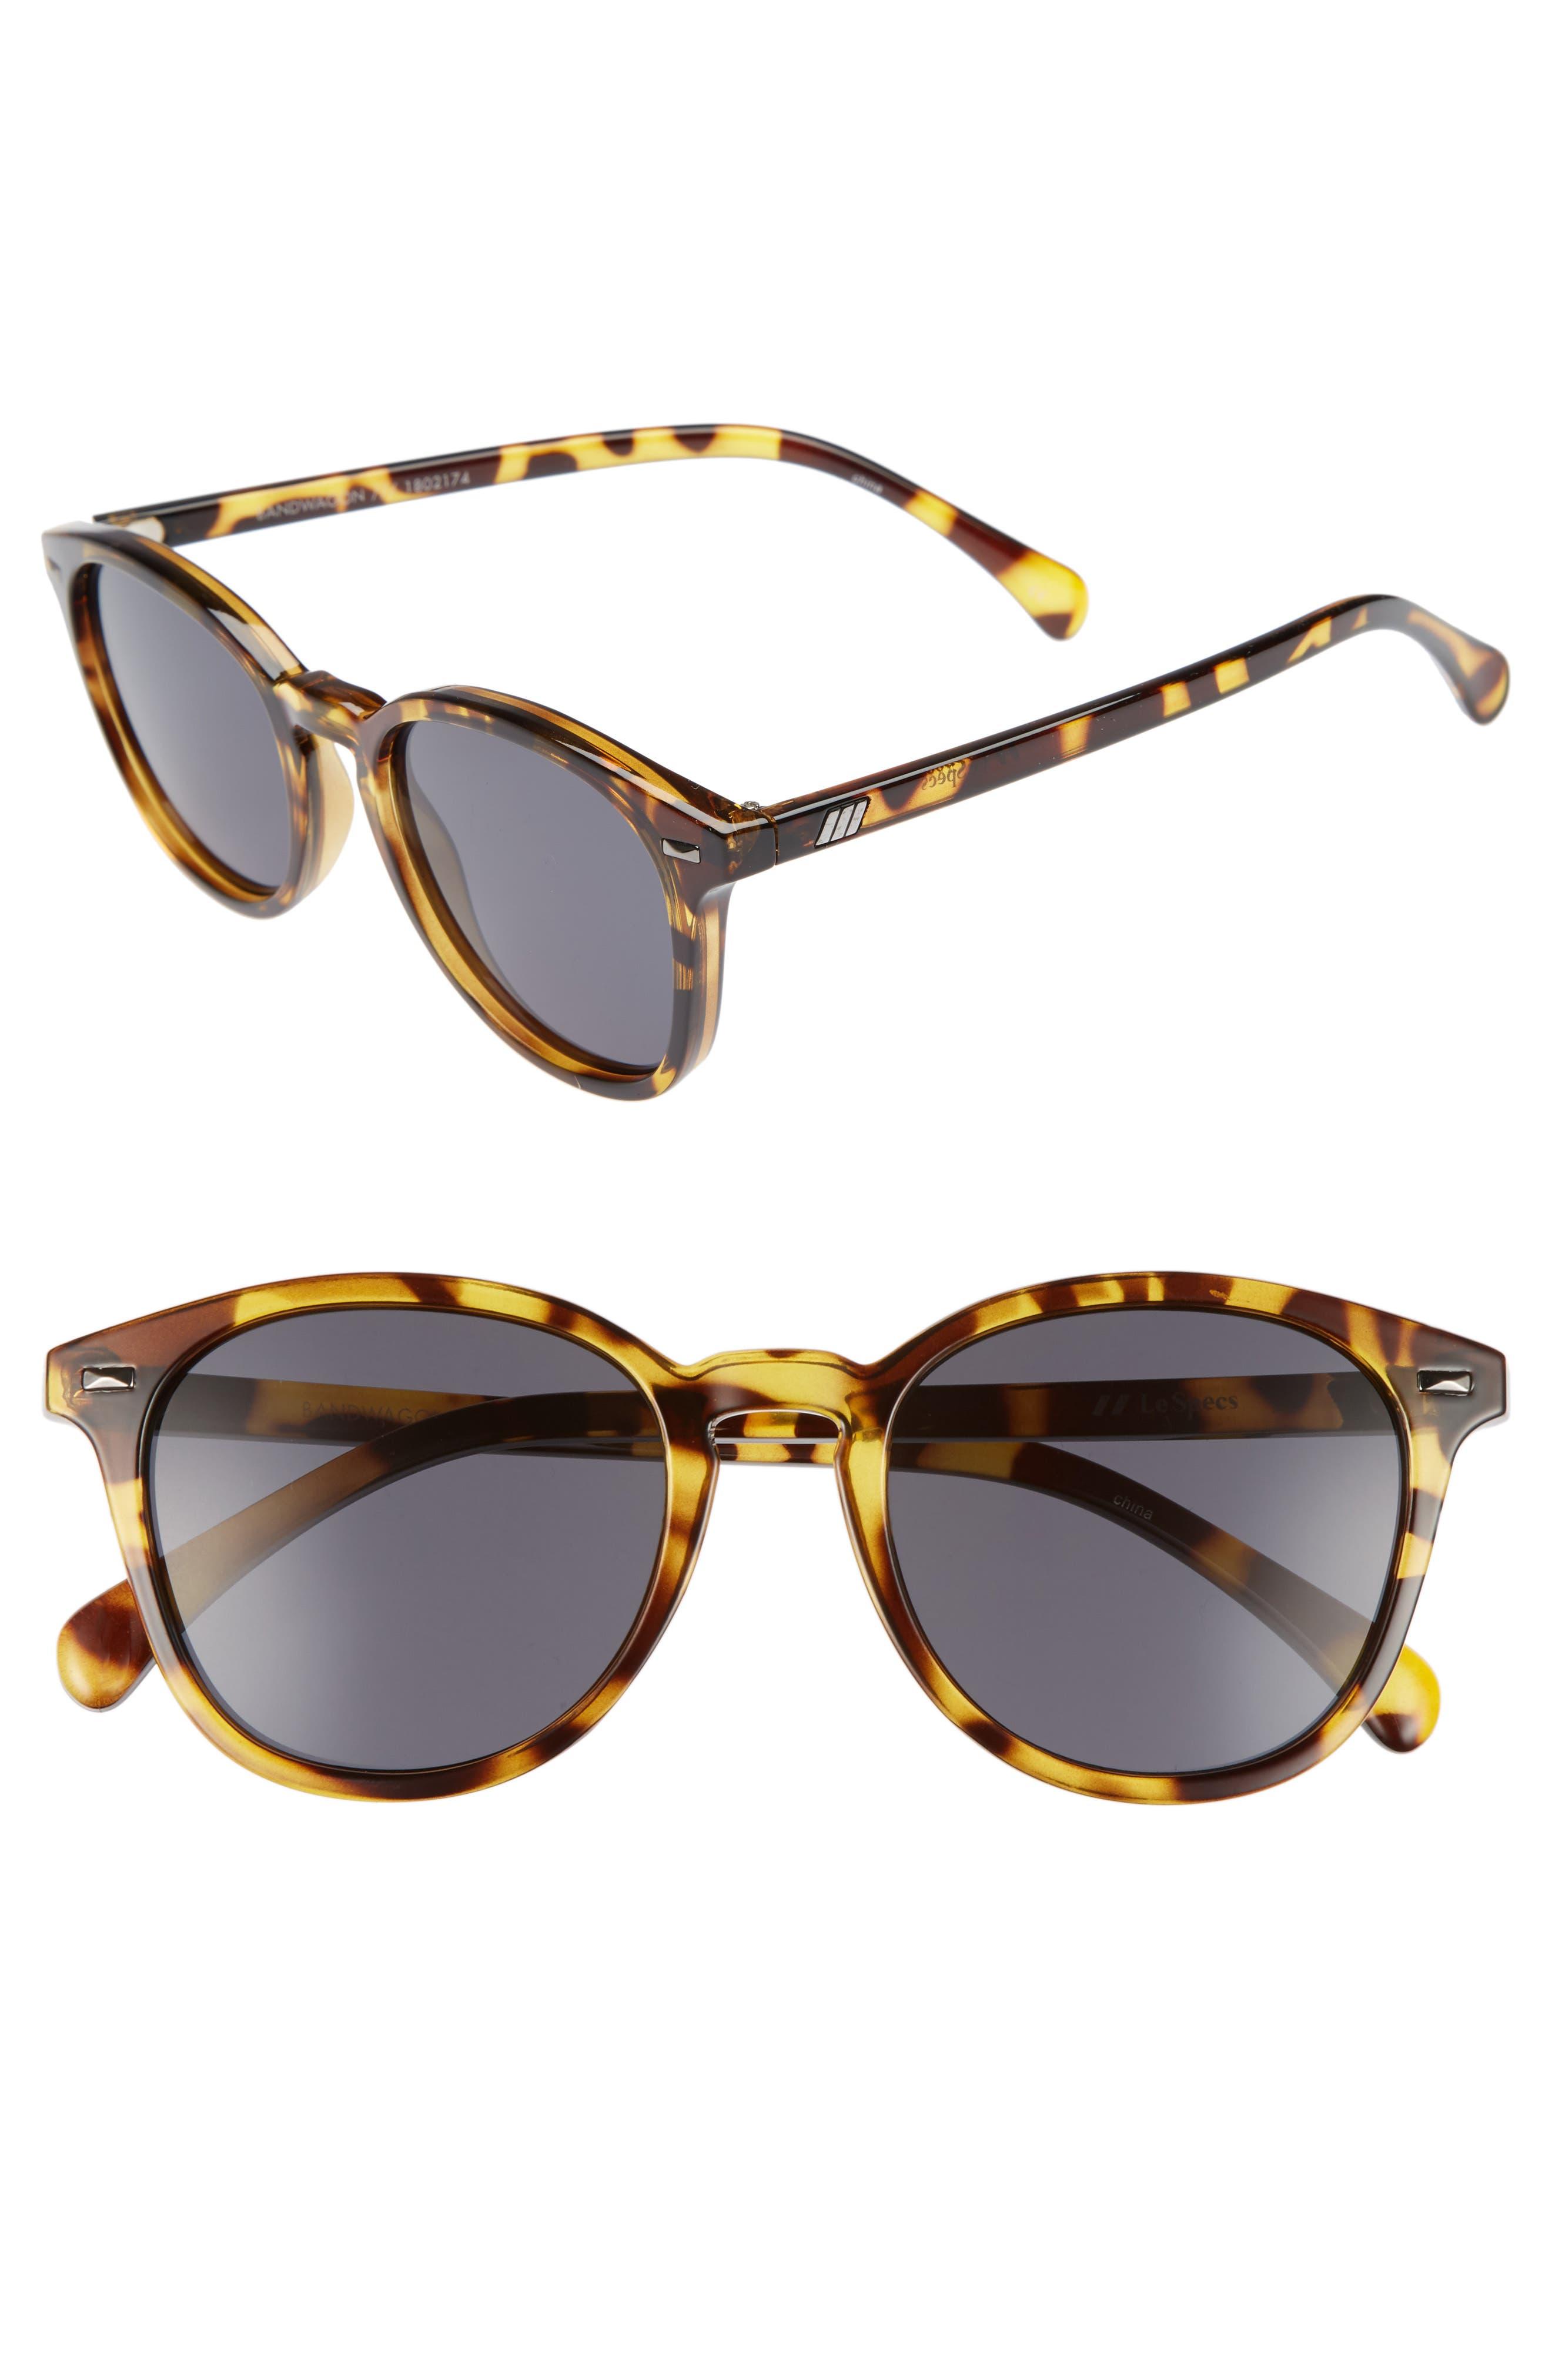 Bandwagon 50mm Sunglasses,                         Main,                         color, SYRUP TORTOISE